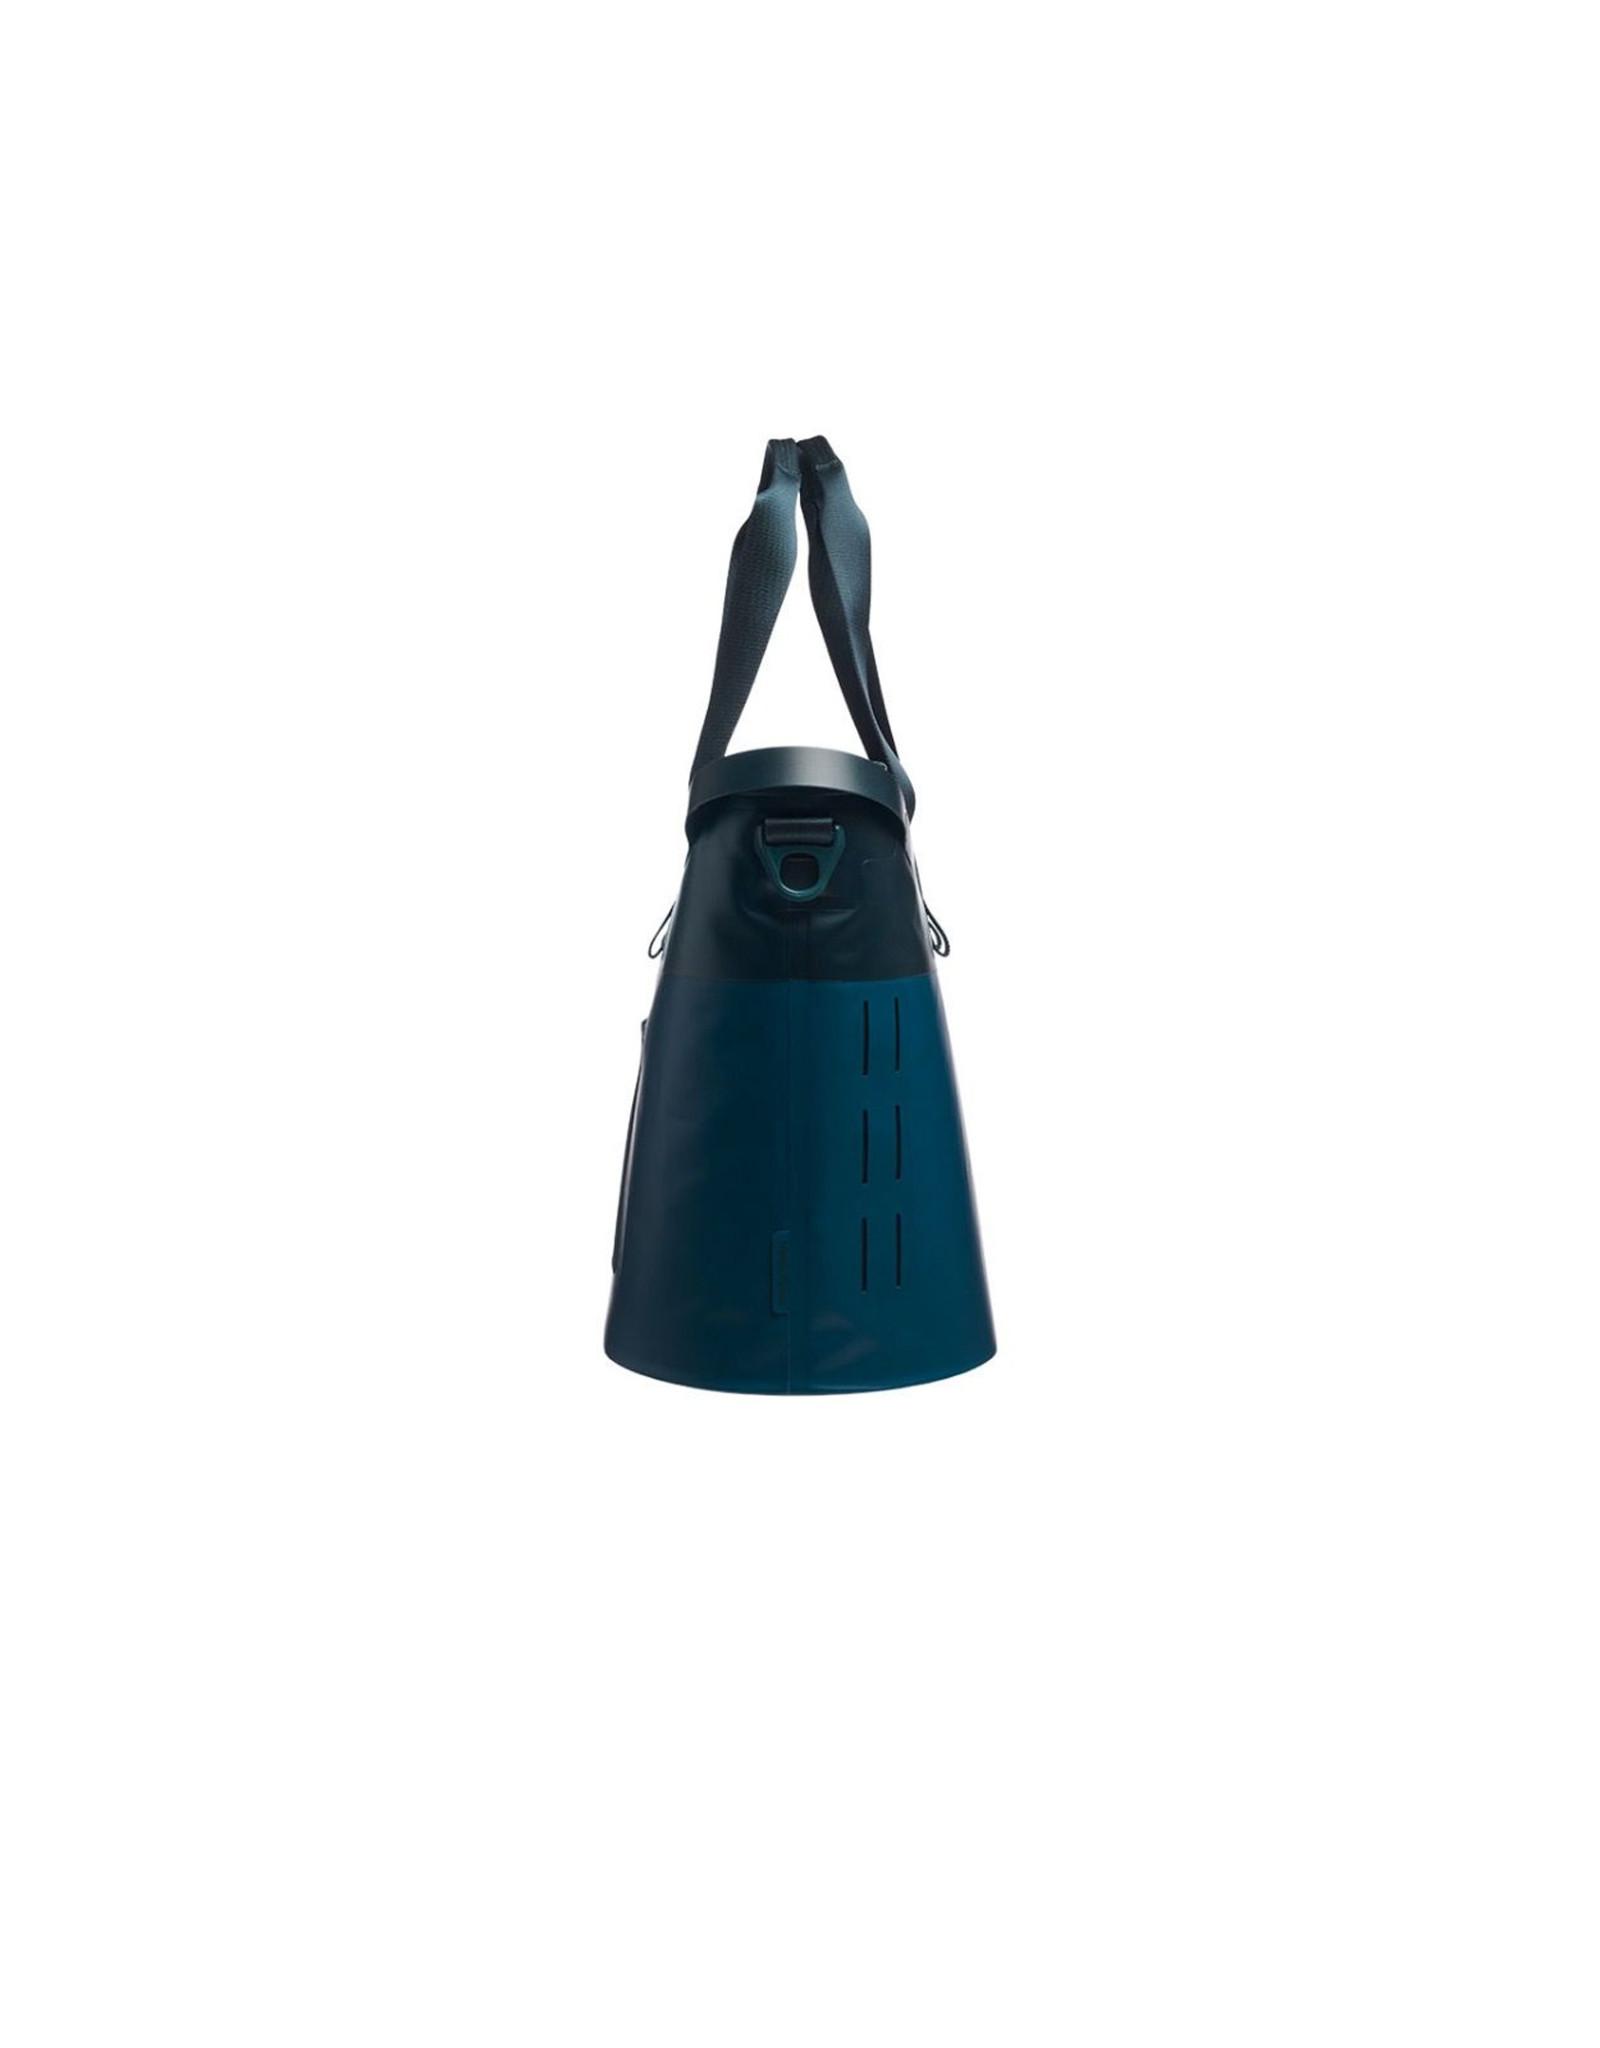 Hydro flask Soft Cooler Hydro Flask 26L